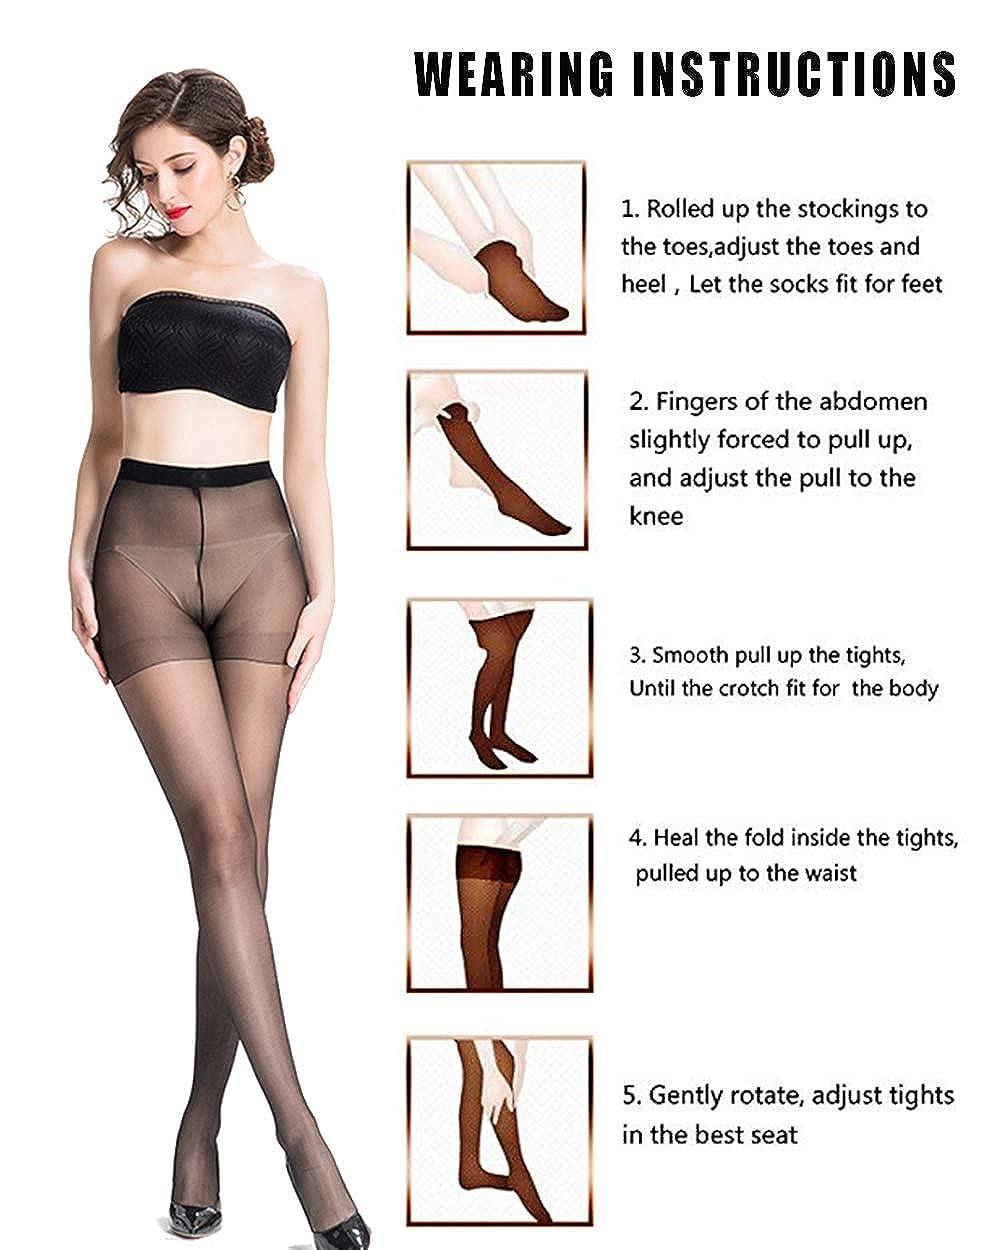 71eadb01e Pantyhose for Women Sheer Stockings 3 pairs Full Length with Comfort Stretch  and Diy Cutting 15 Denier (Medium